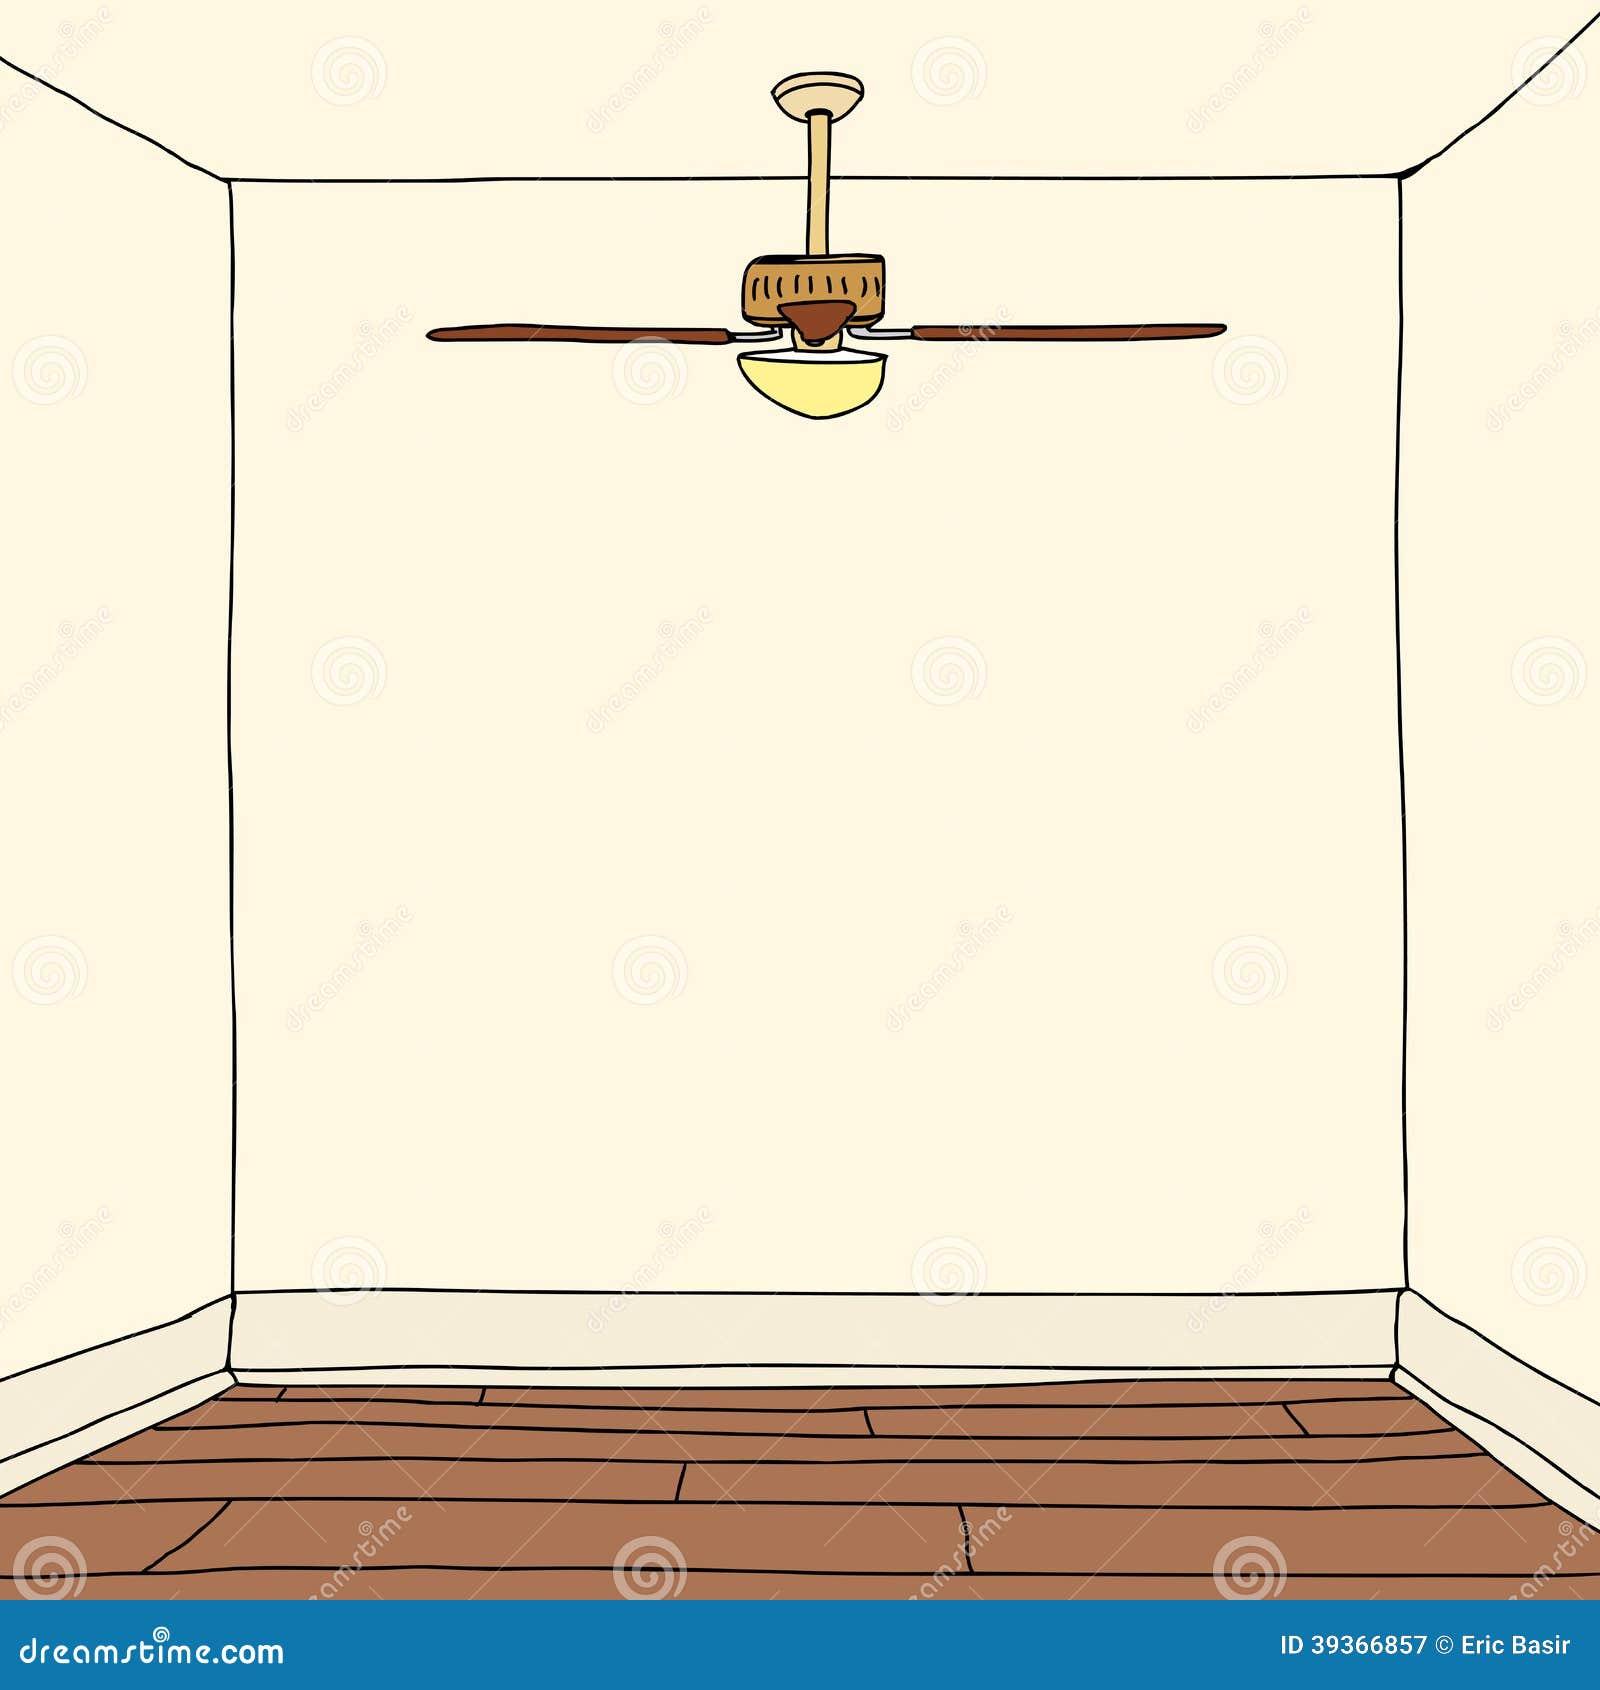 Room With Hardwood Floors Stock Vector - Image: 39366857